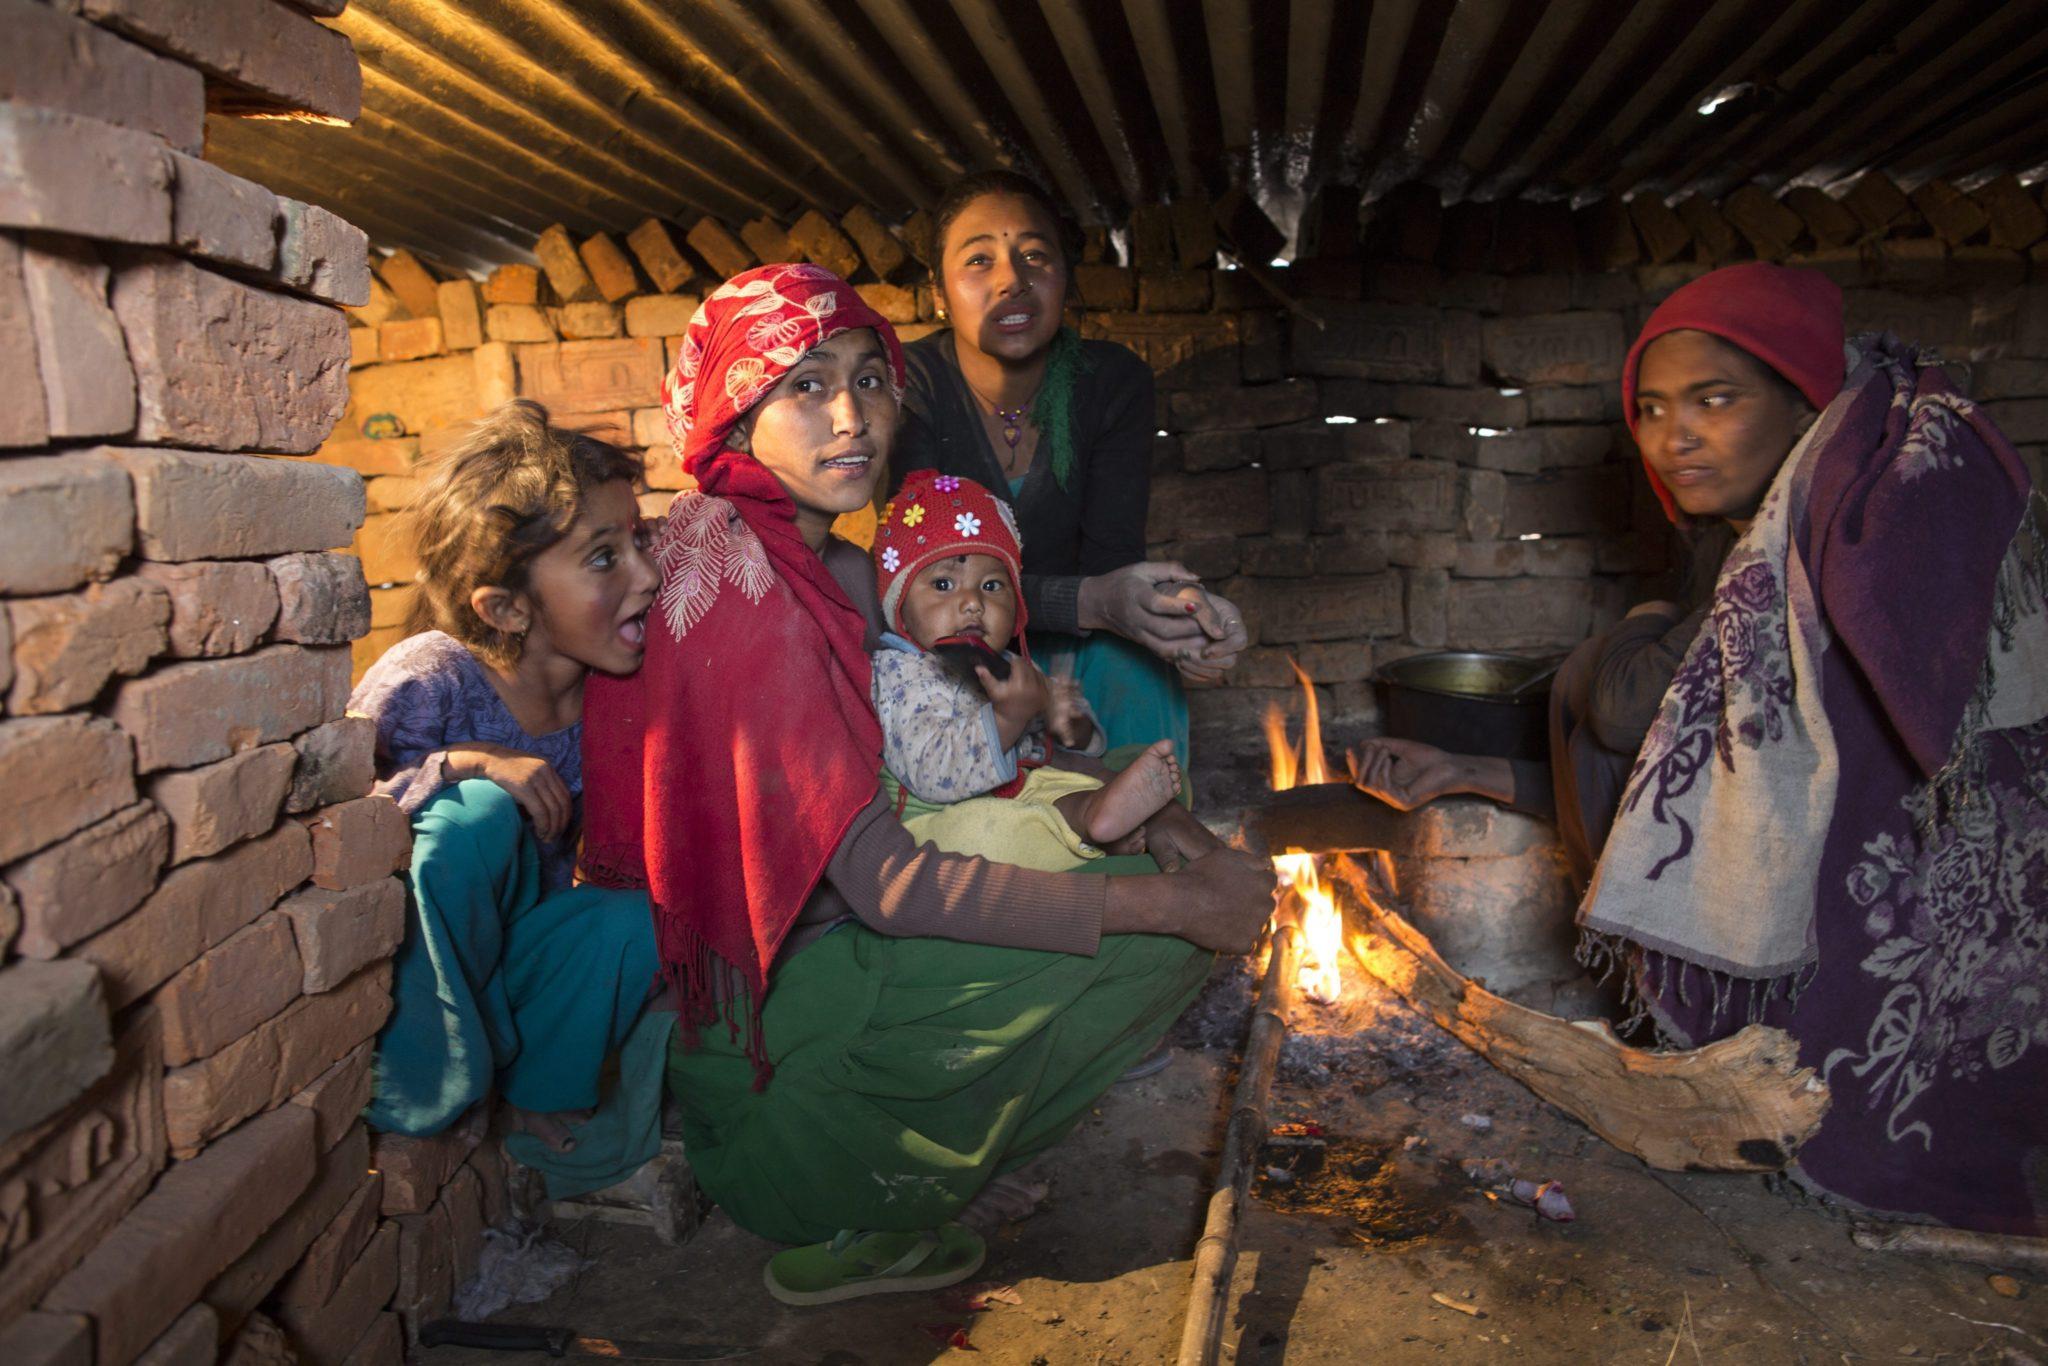 Nepal: sezon zimowy w cegielni w Lilatpur (foto. PAP/EPA/NARENDRA SHRESTHA)